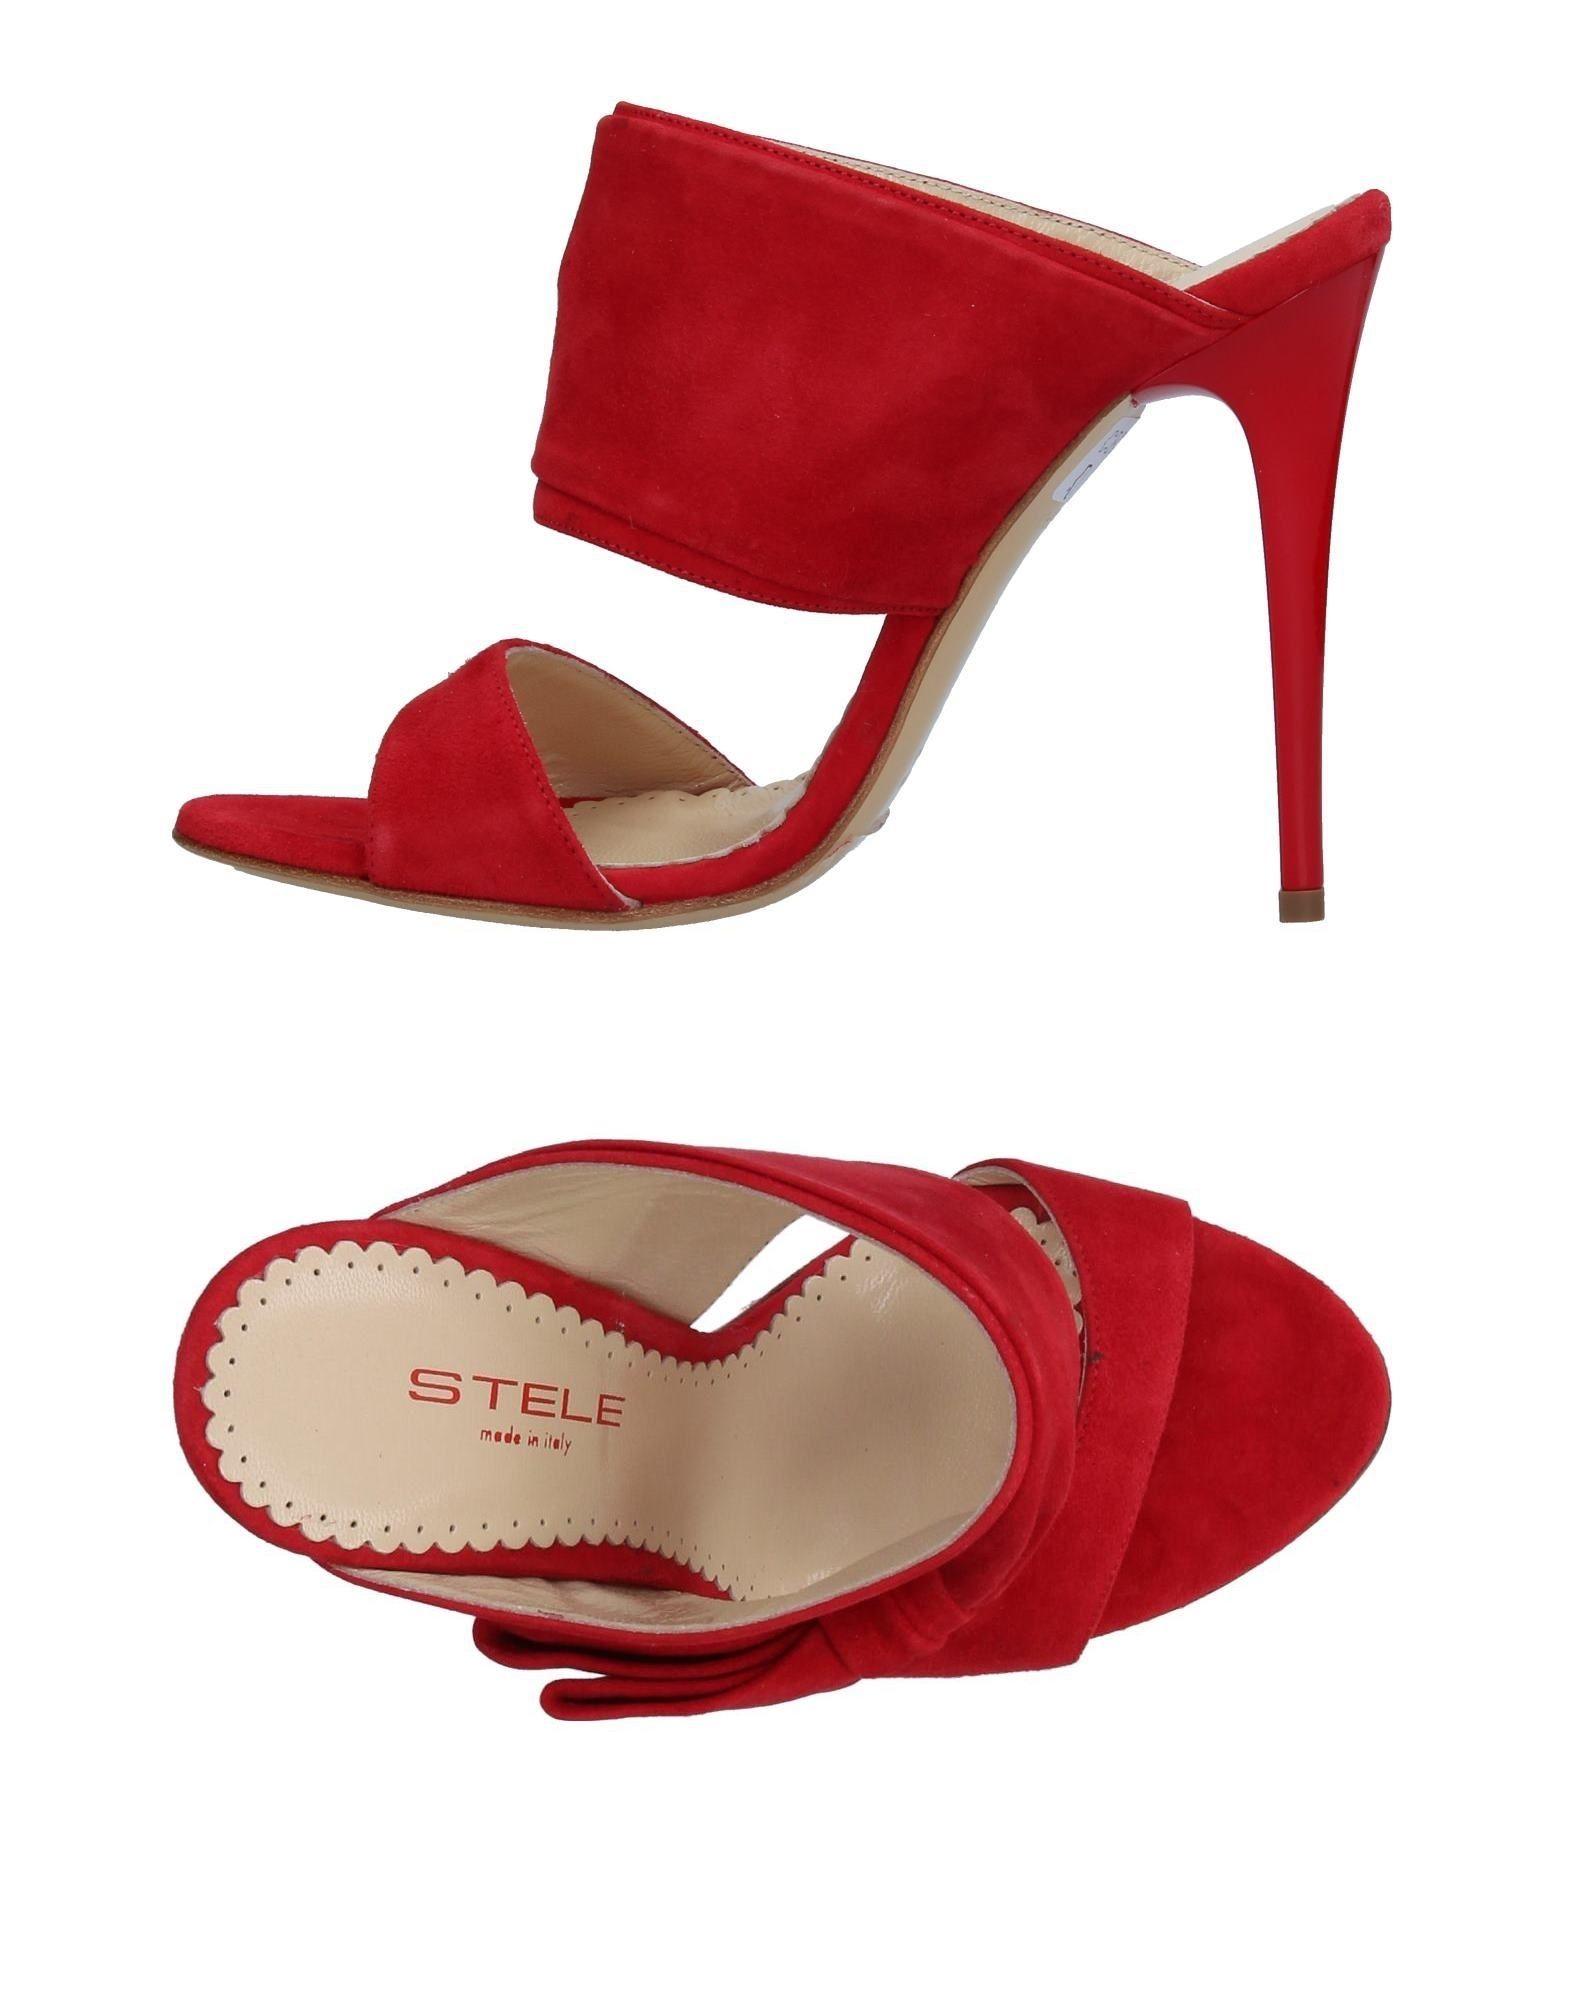 Stele Sandalen Damen  11375373SF Gute Qualität beliebte Schuhe